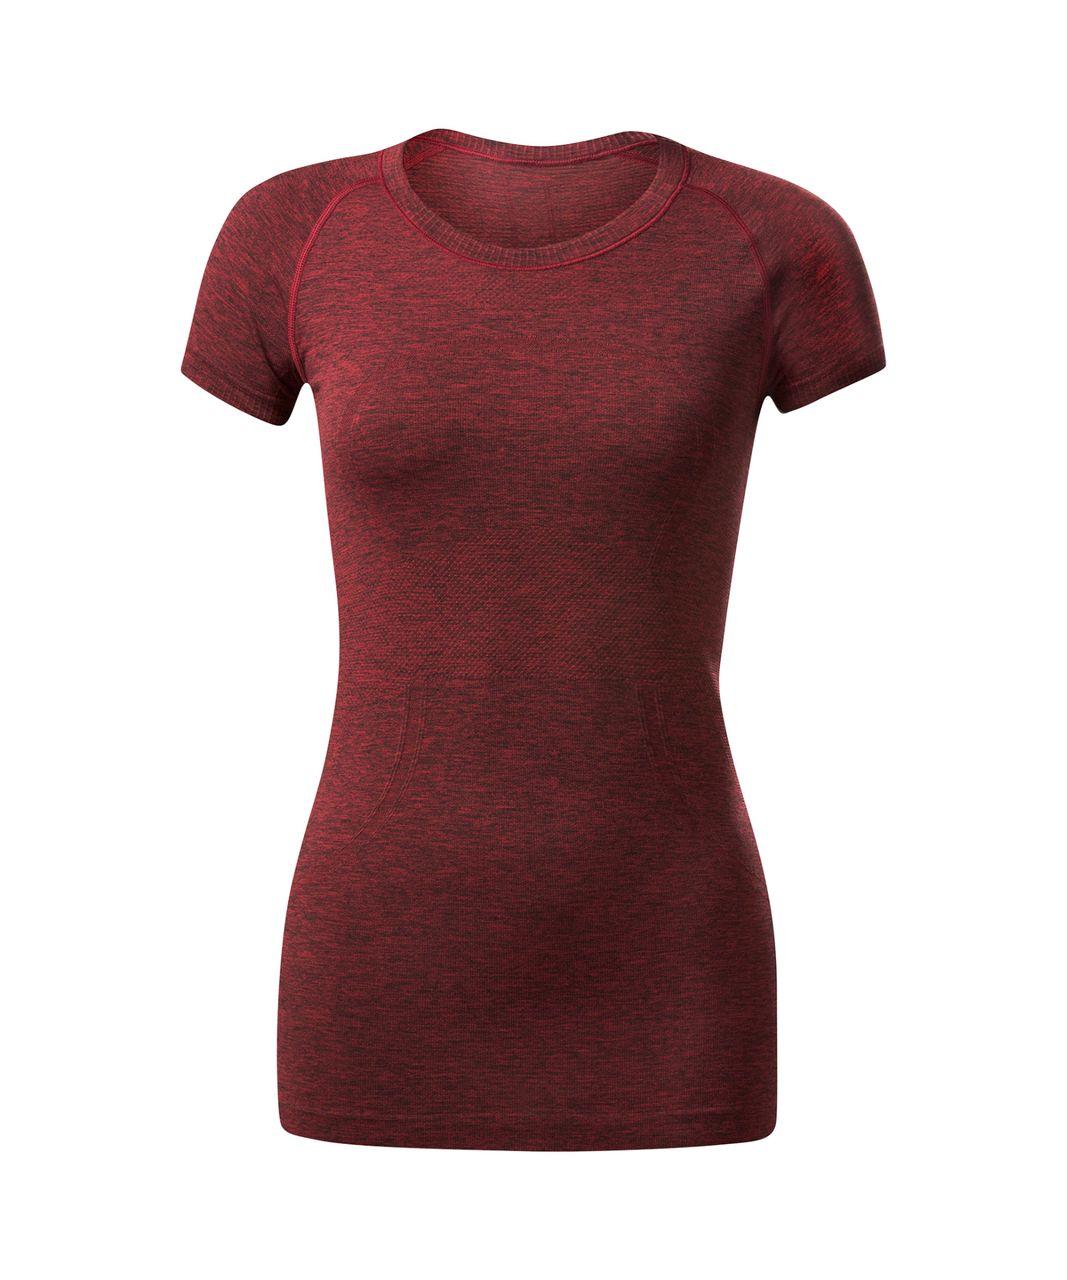 Lululemon Swiftly Tech Short Sleeve Crew - Black / True Red